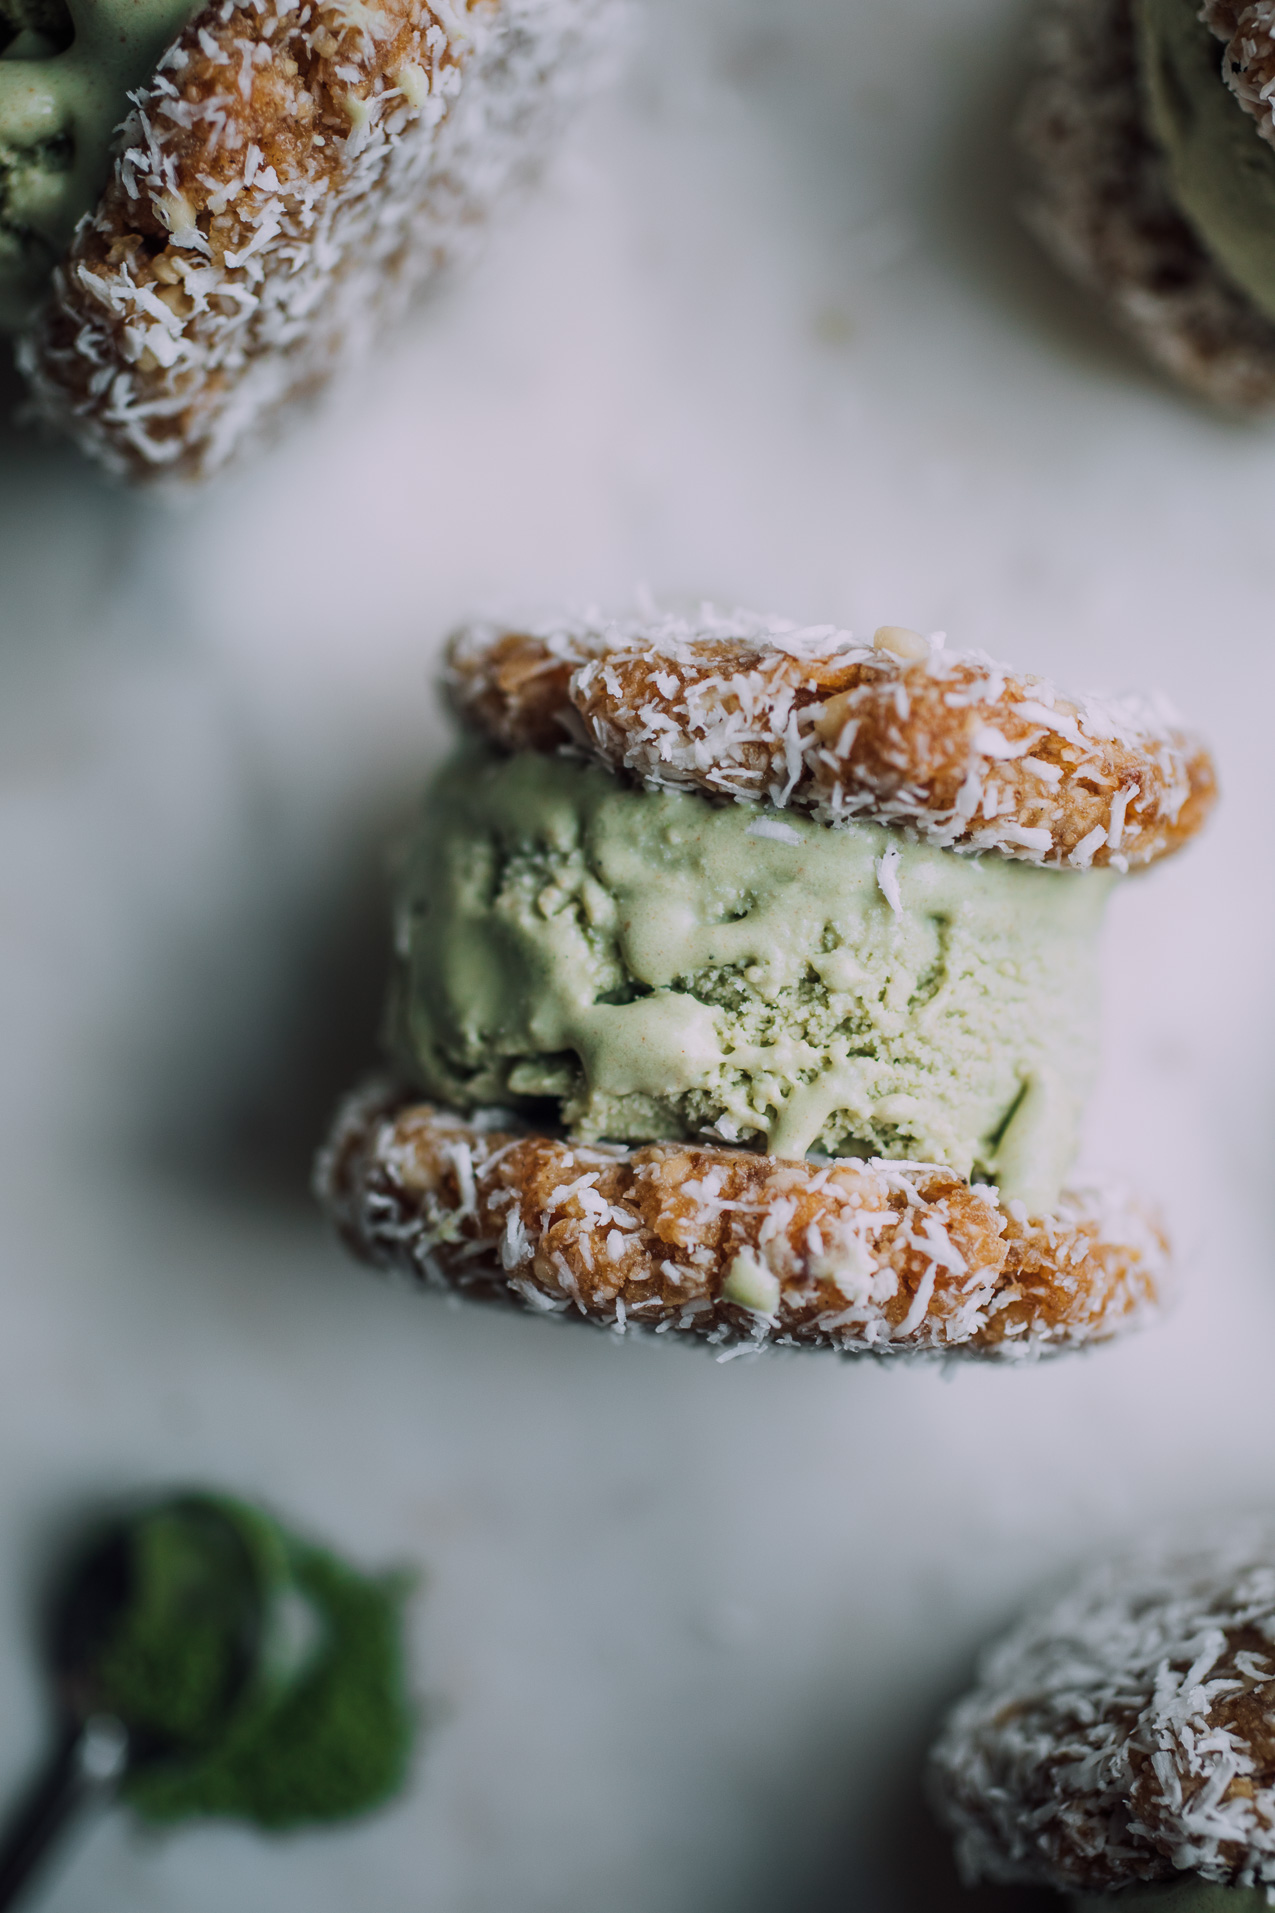 matcha-ice-cream-sandwich-8360.jpg